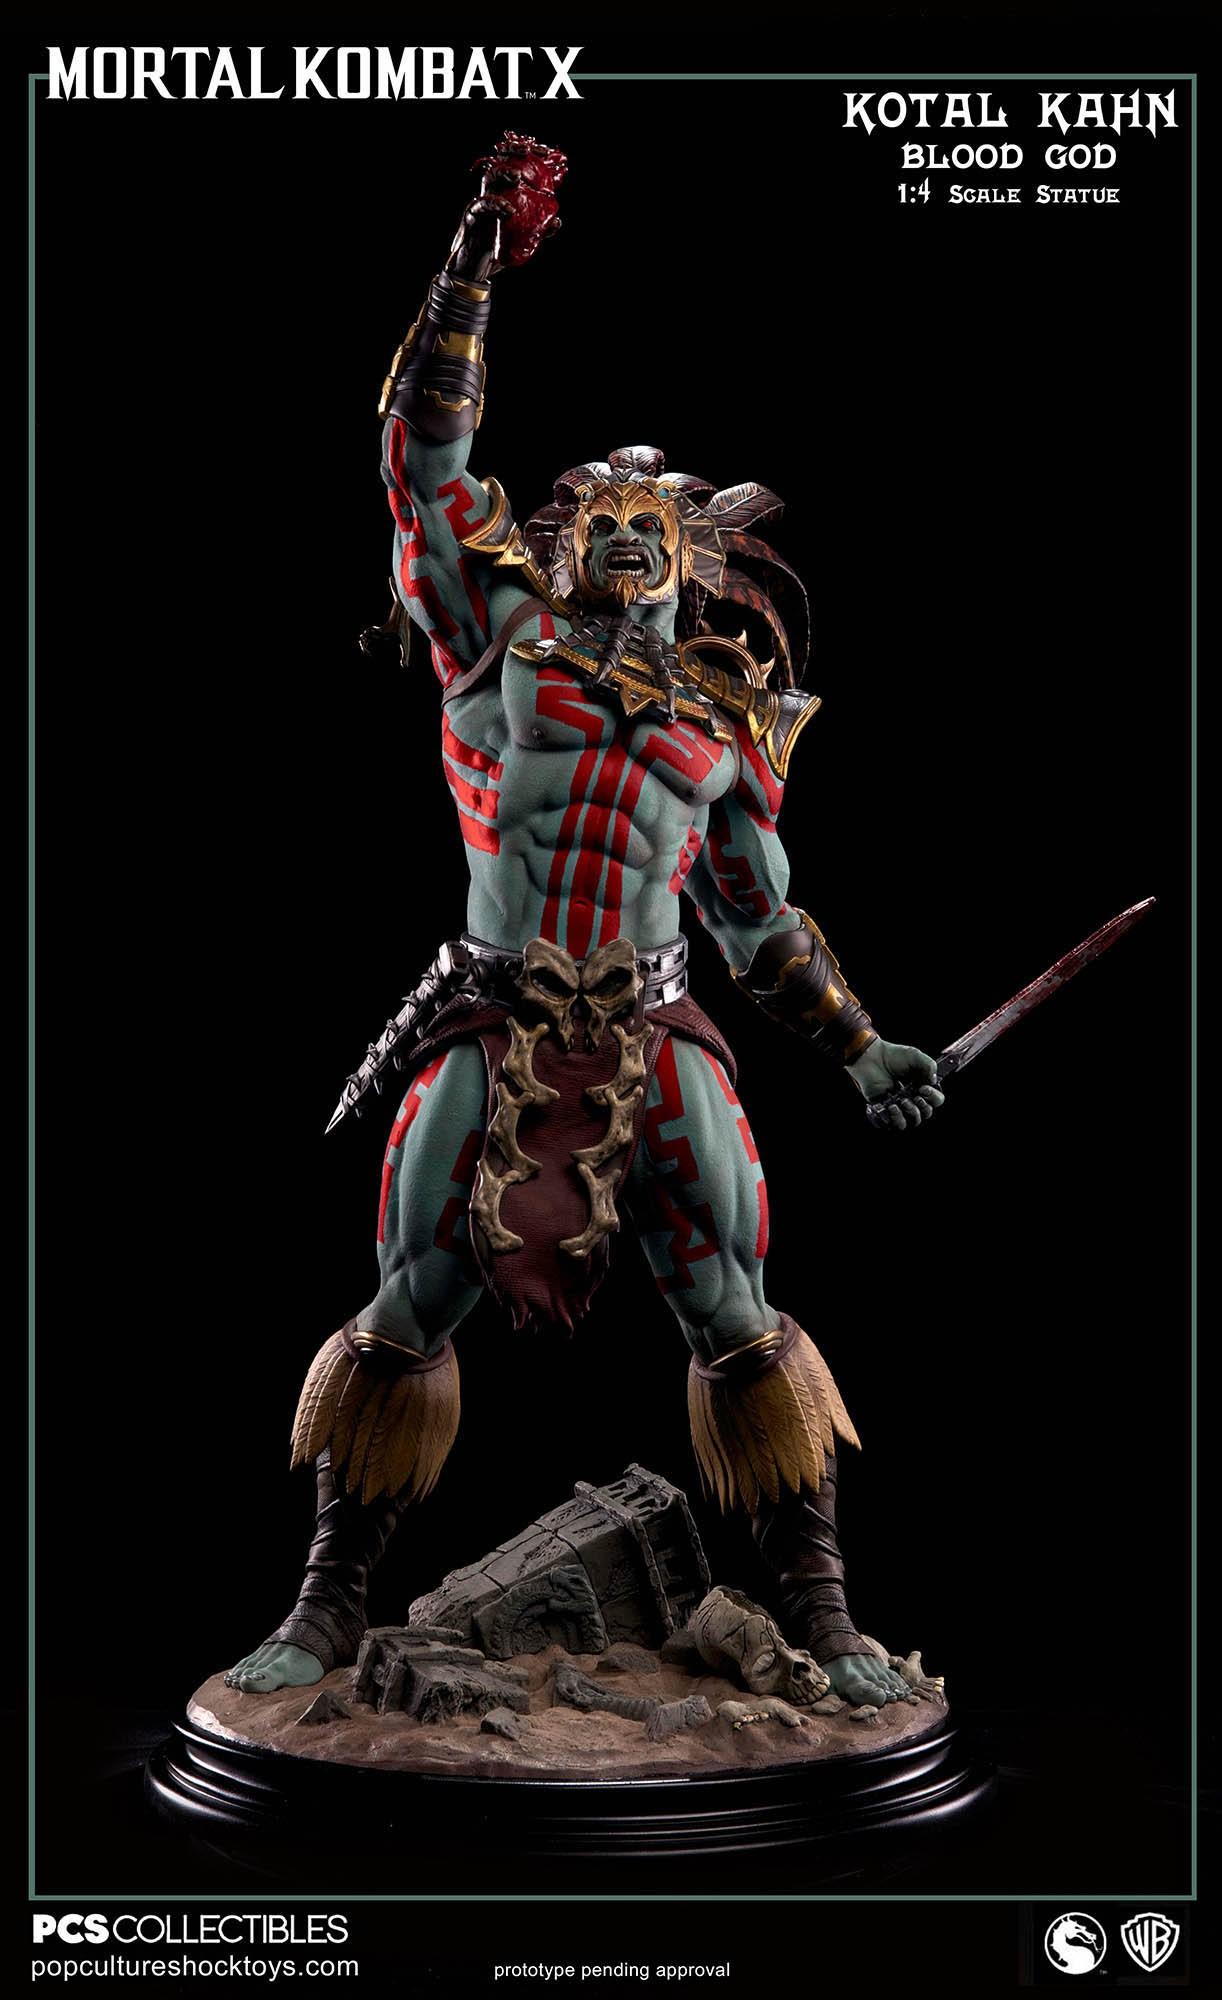 [Pop Culture Shock] Mortal Kombat X: Kotal Kahn 1:4 scale PCS-Kotal-Kahn-Blood-God-002